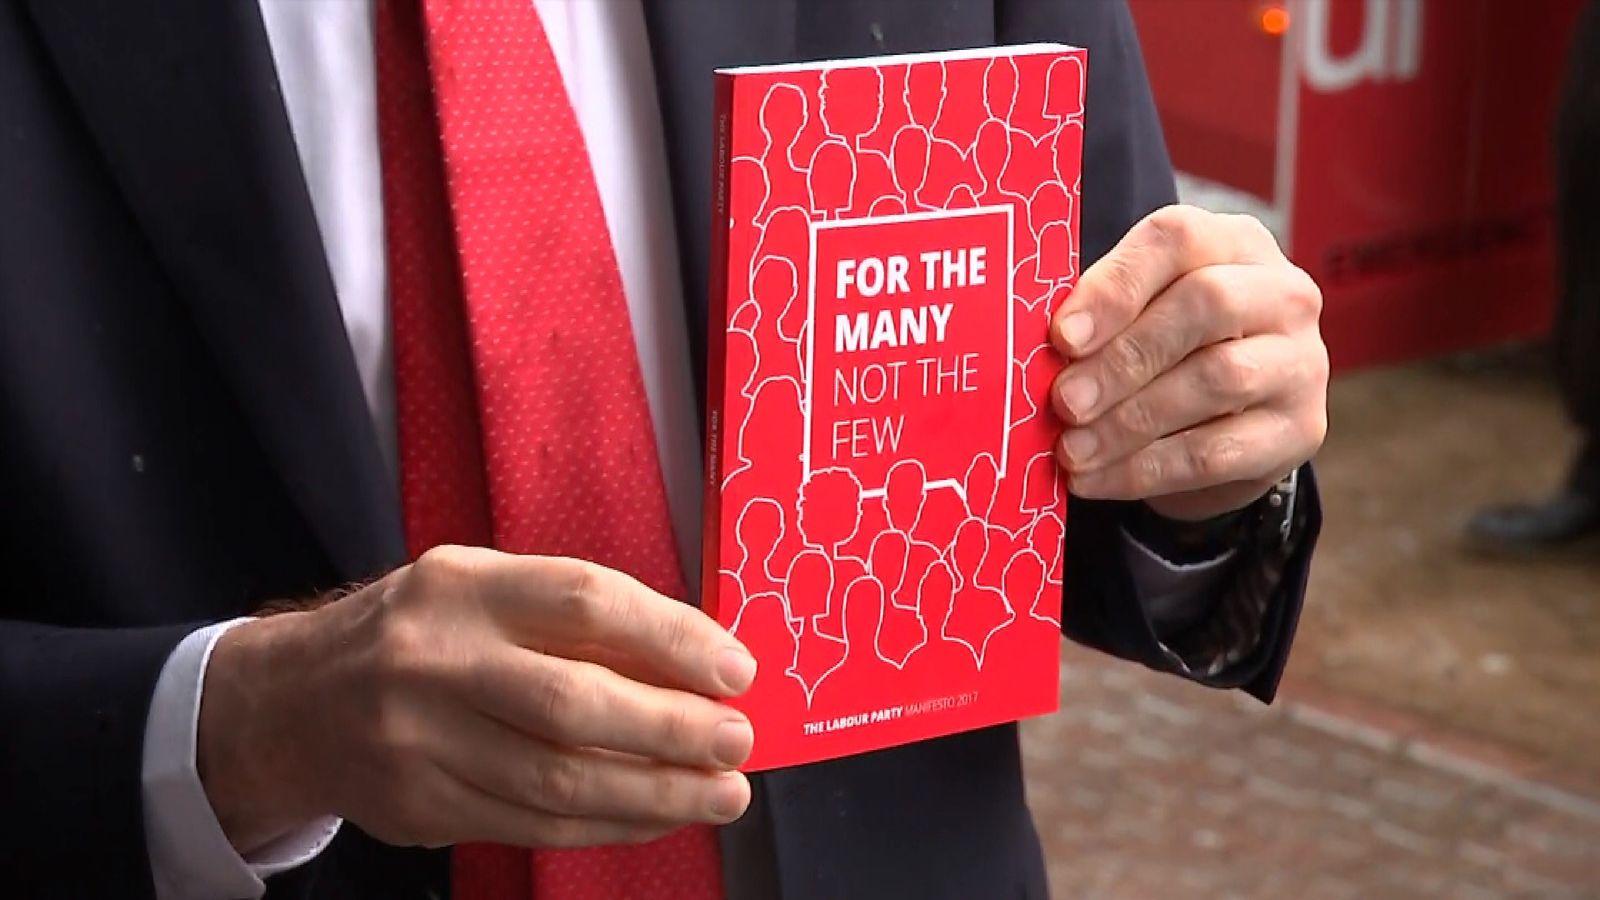 Jeremy Corbyn has launches Labour's election manifesto